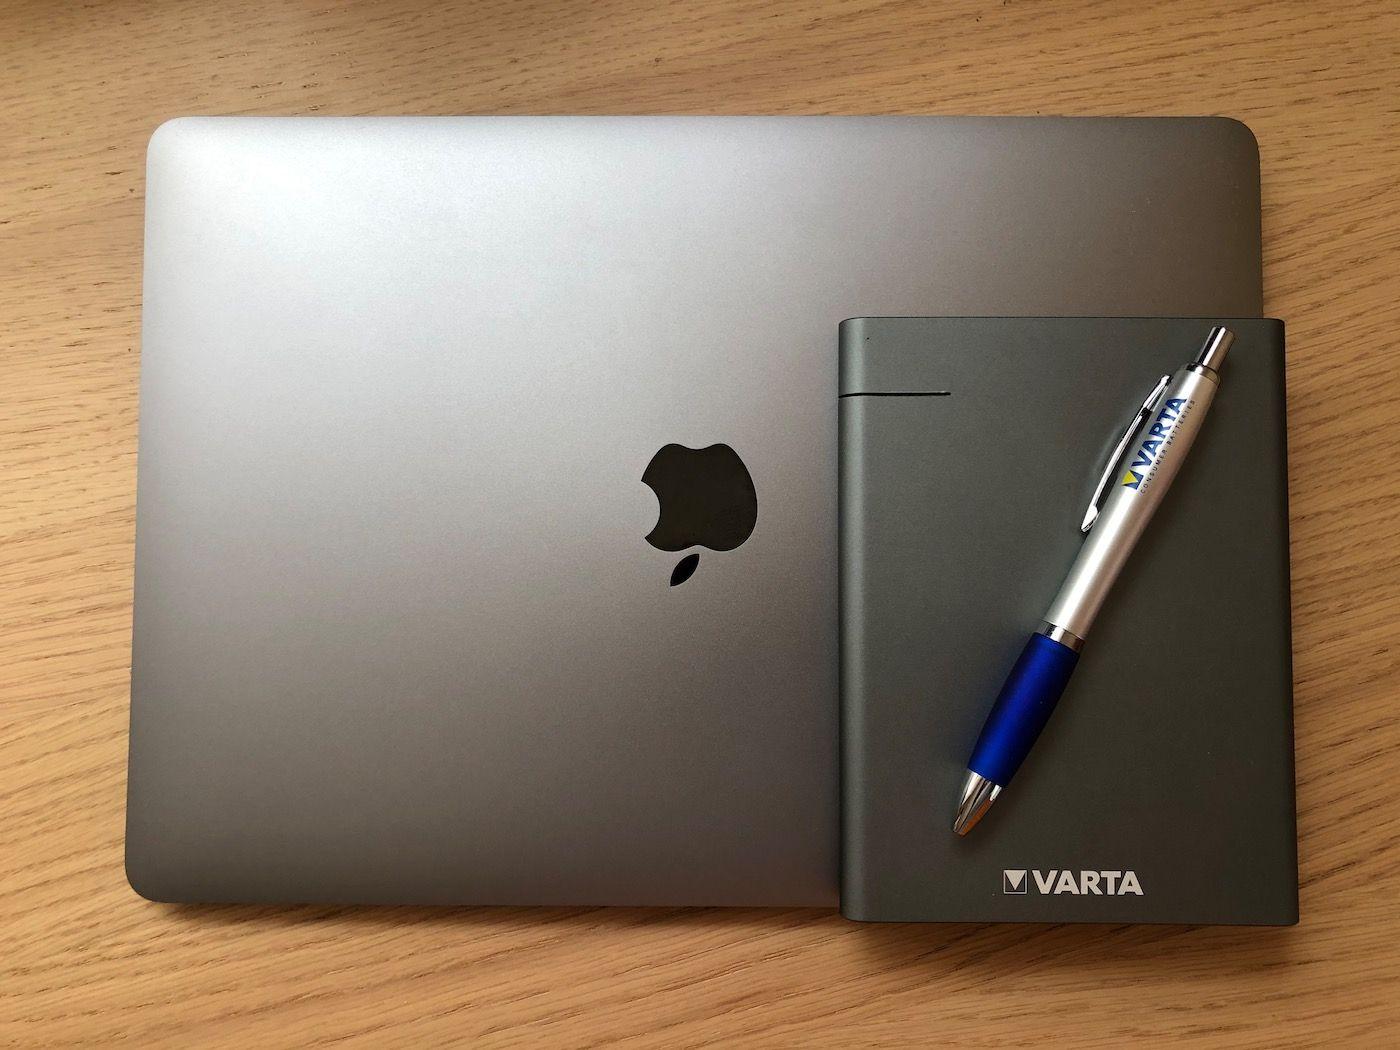 Varta PowerBank Slim 12000mAh and MacBook Air Space Gray